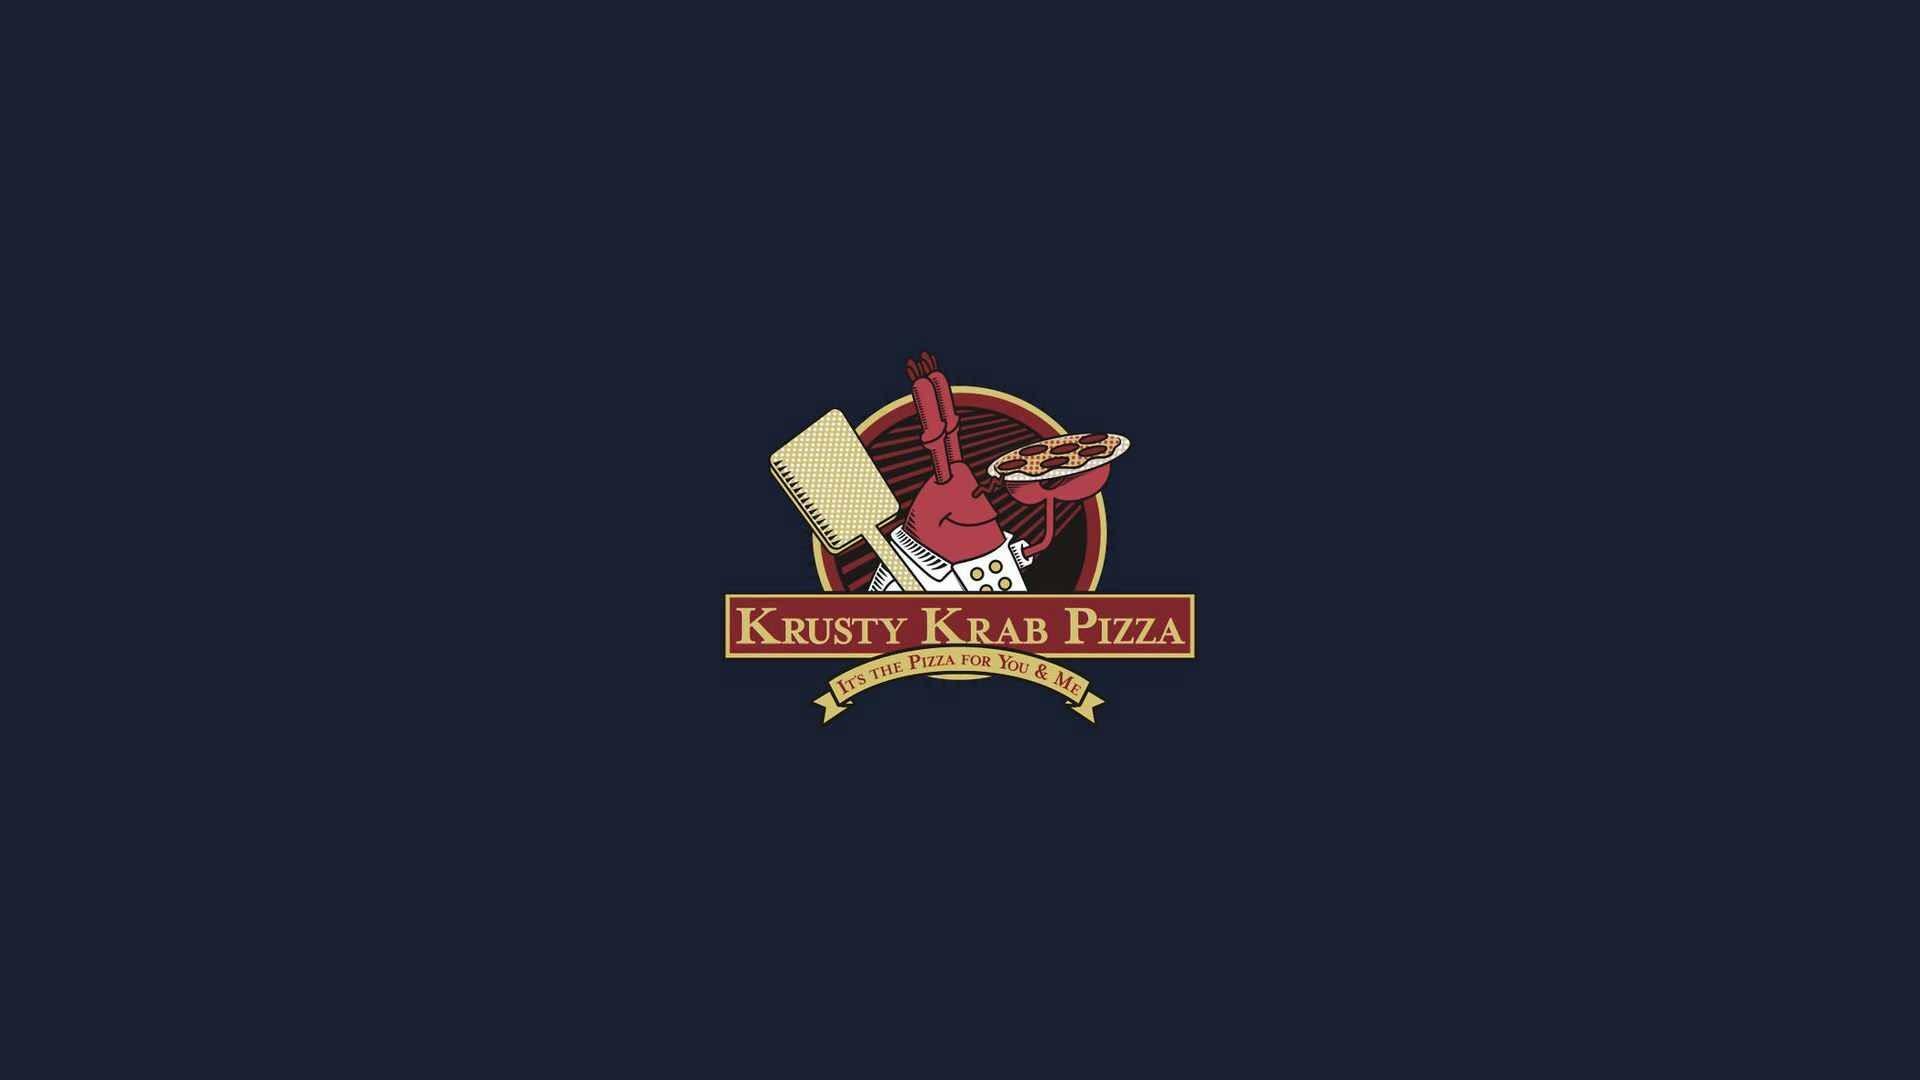 Krusty Krab Pizza Logo